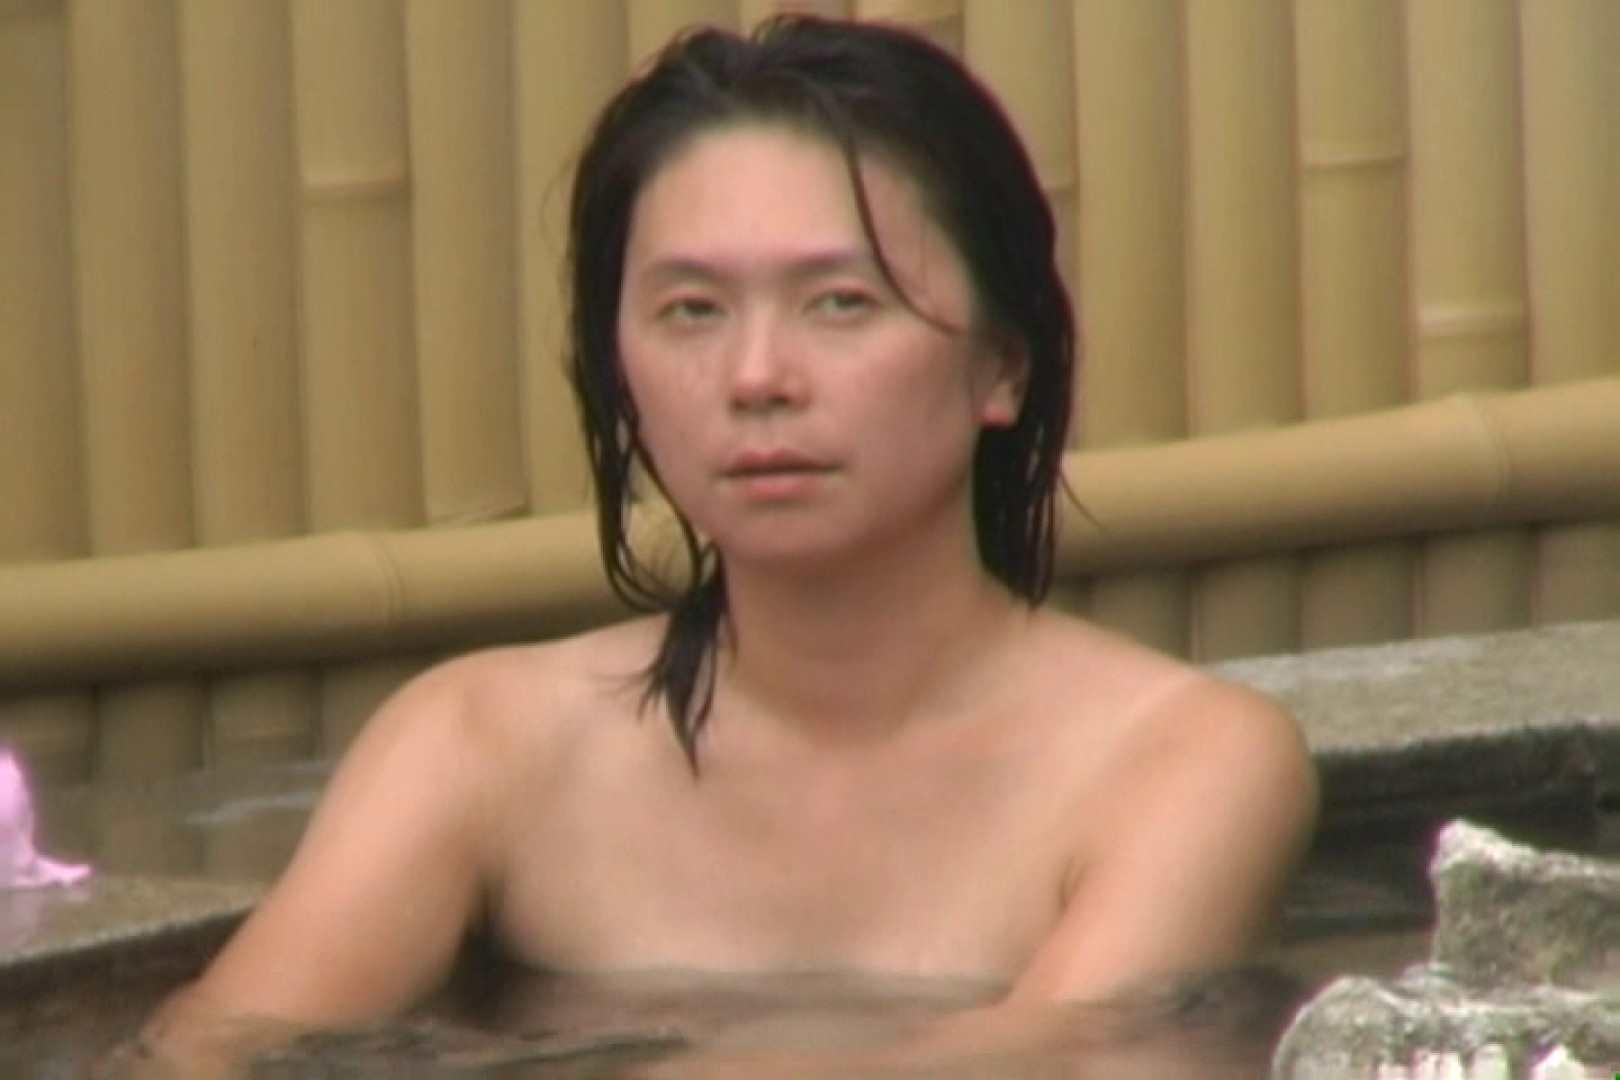 Aquaな露天風呂Vol.619 HなOL オマンコ動画キャプチャ 107pic 47